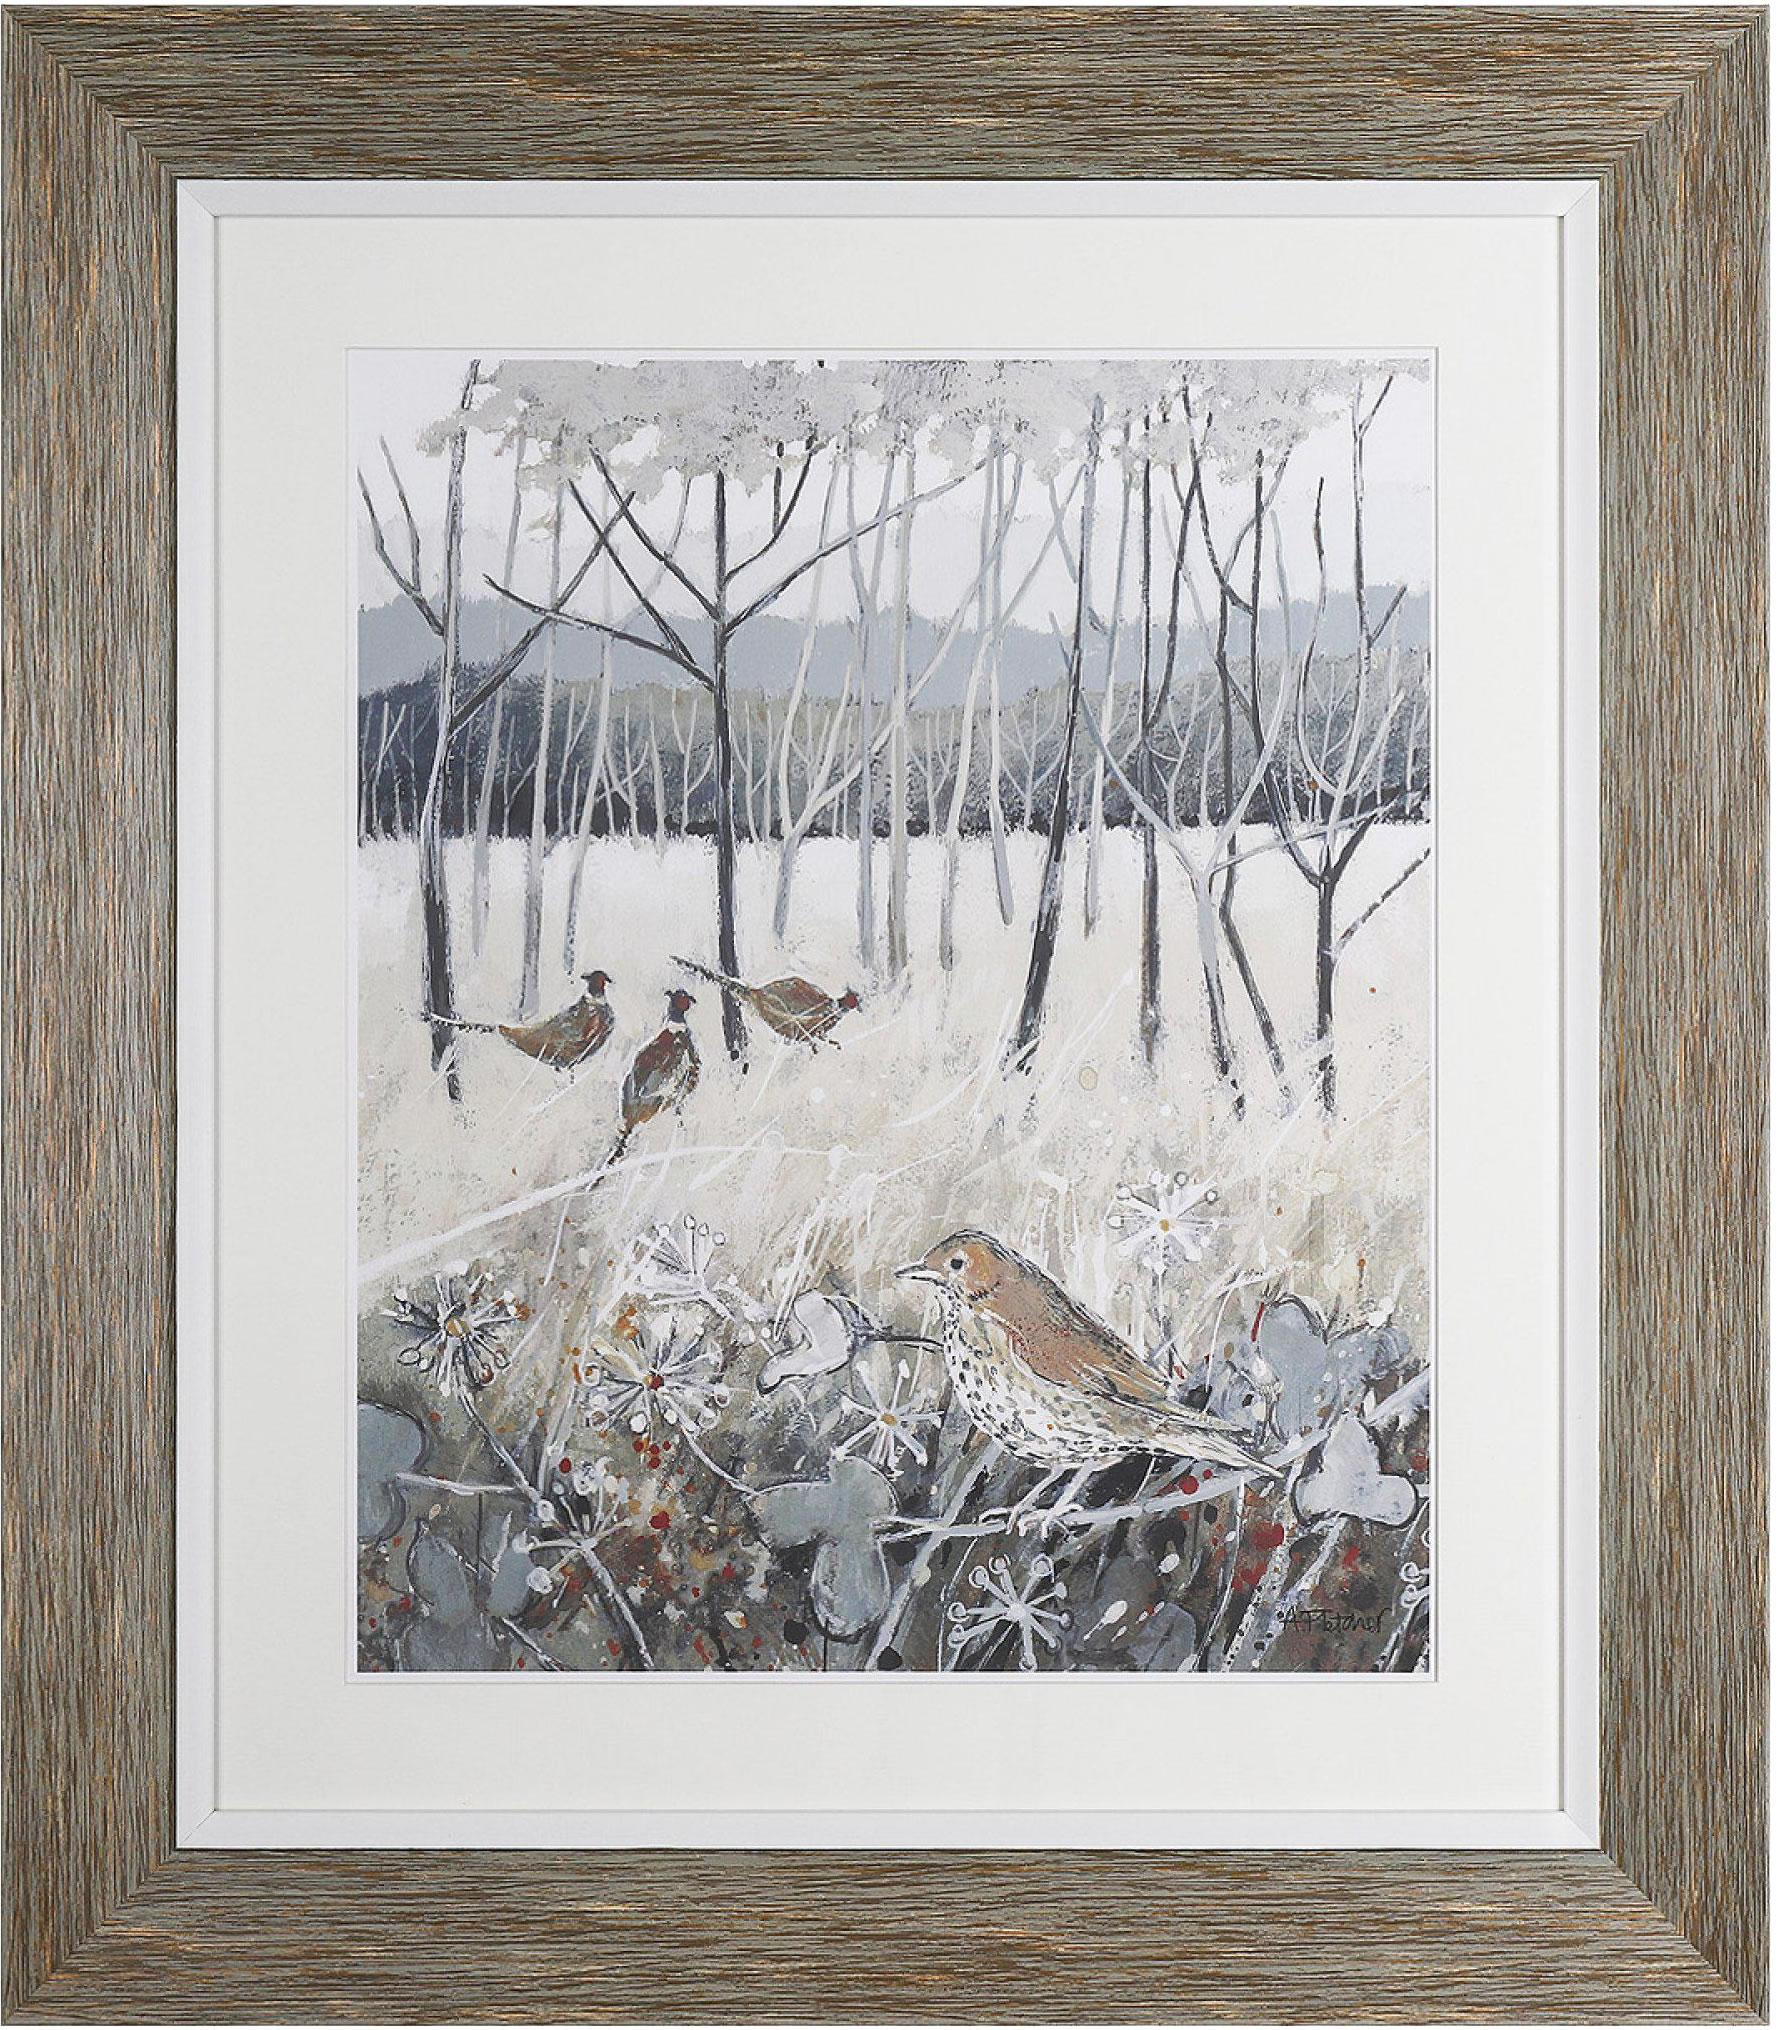 Birds in Oak Woodlands - Framed Art Print - Painting of Pheasants and Mistle Thrush - Surrounds West Byfleet Surrey